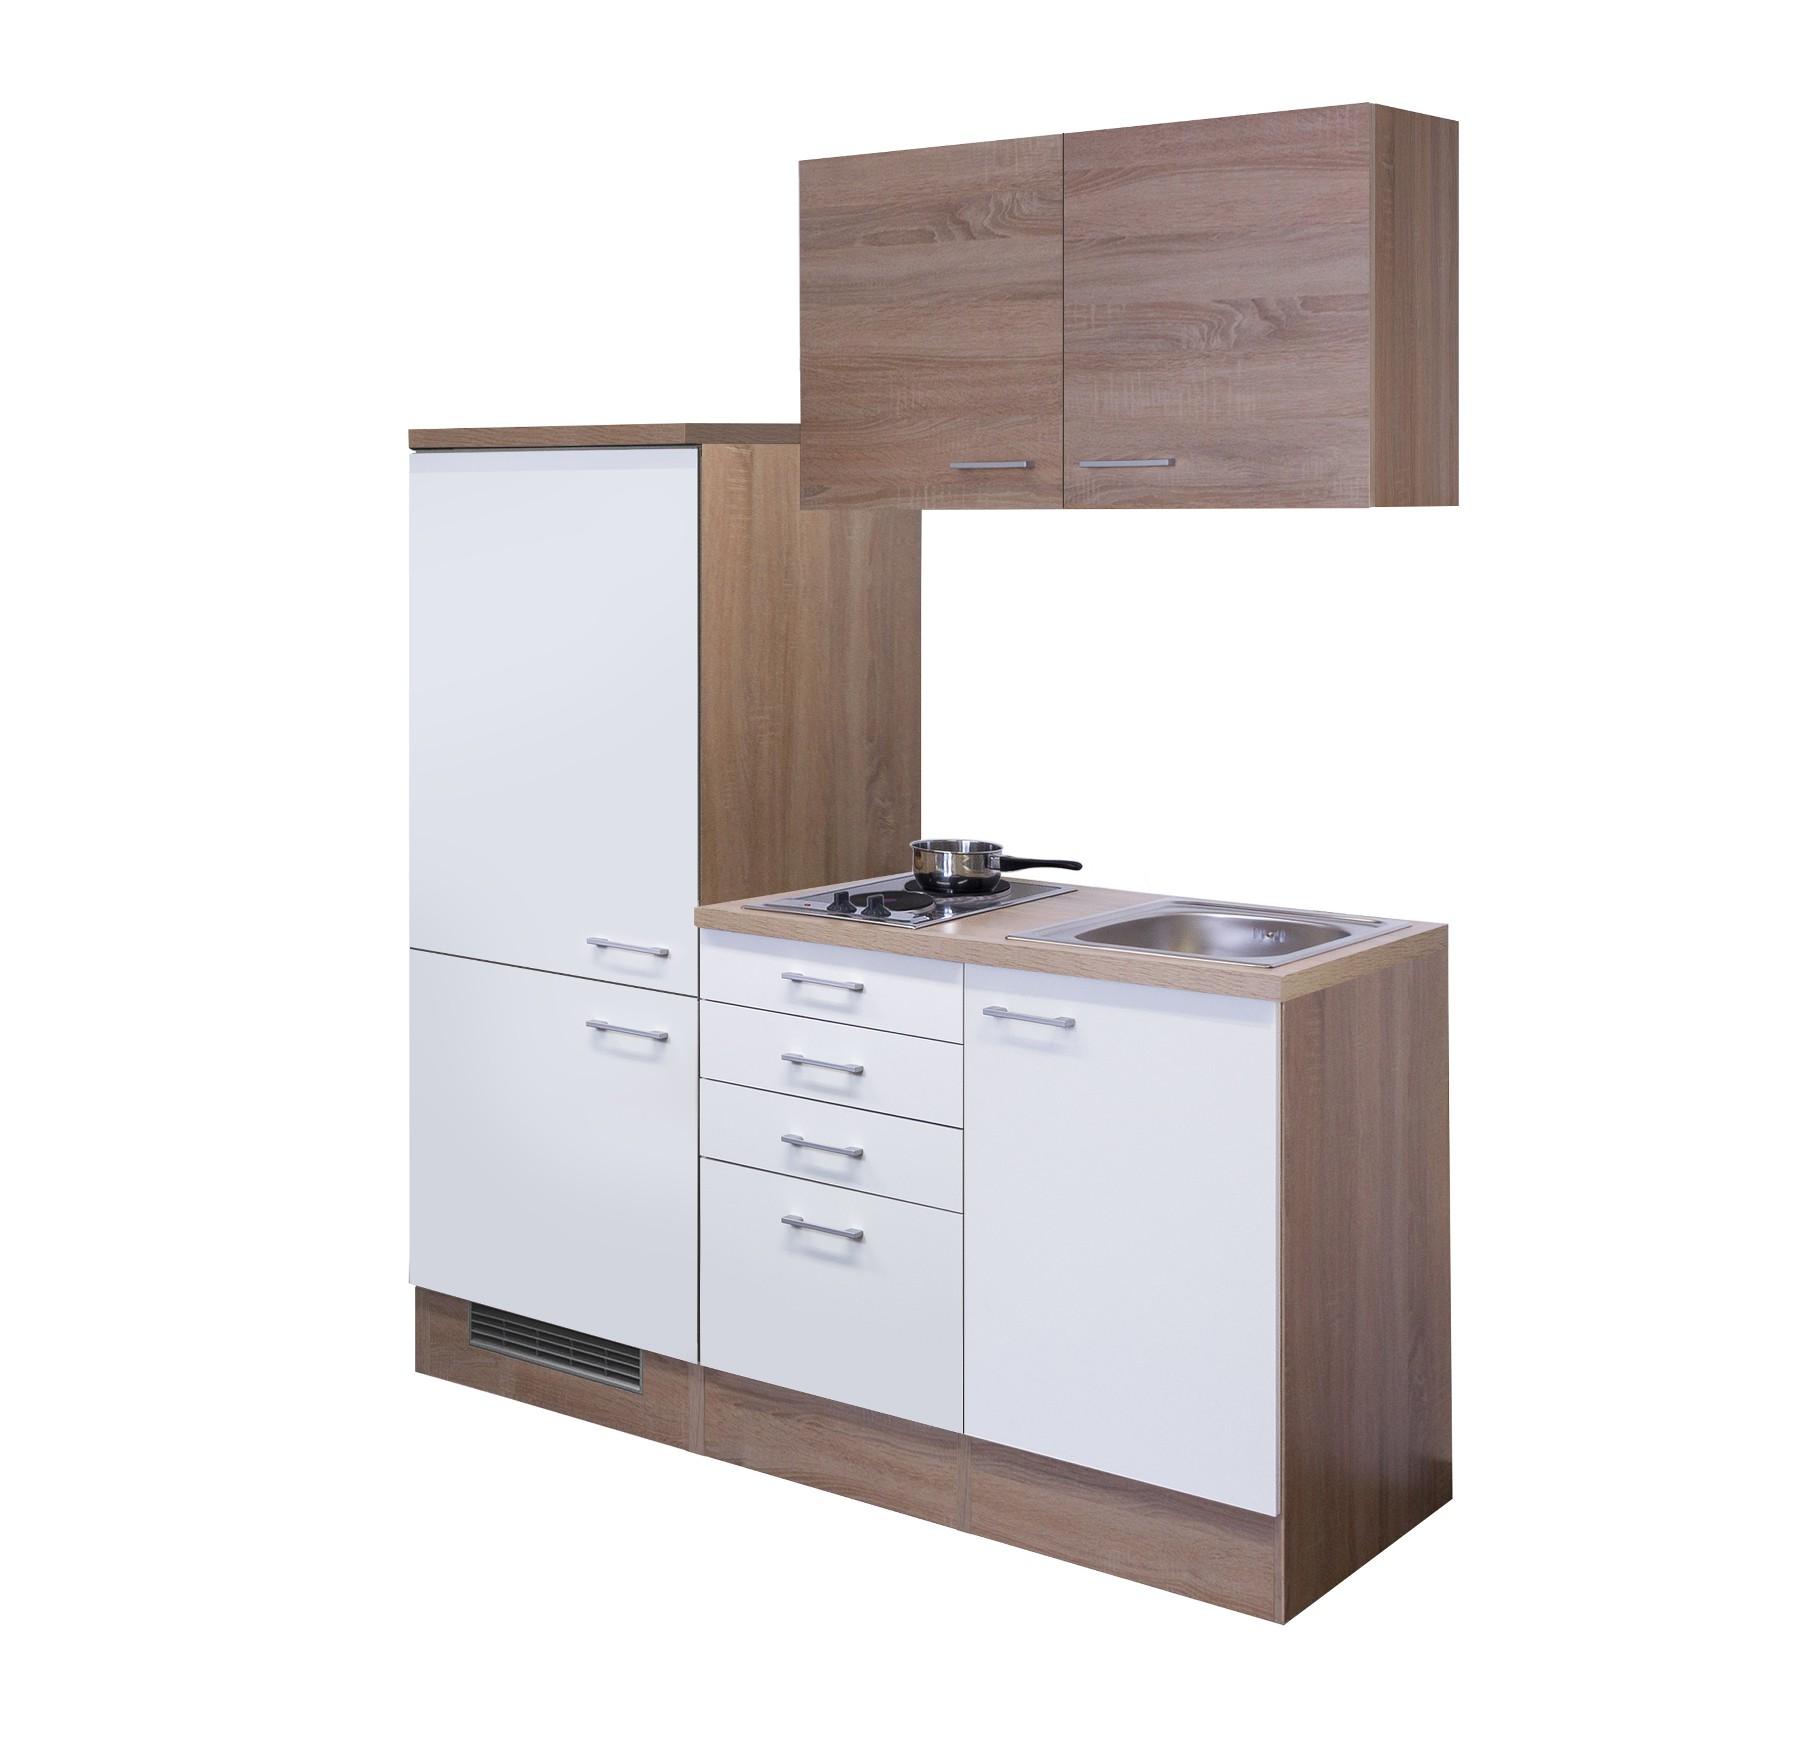 singlek che rom breite 160 cm wei k che singlek chen. Black Bedroom Furniture Sets. Home Design Ideas